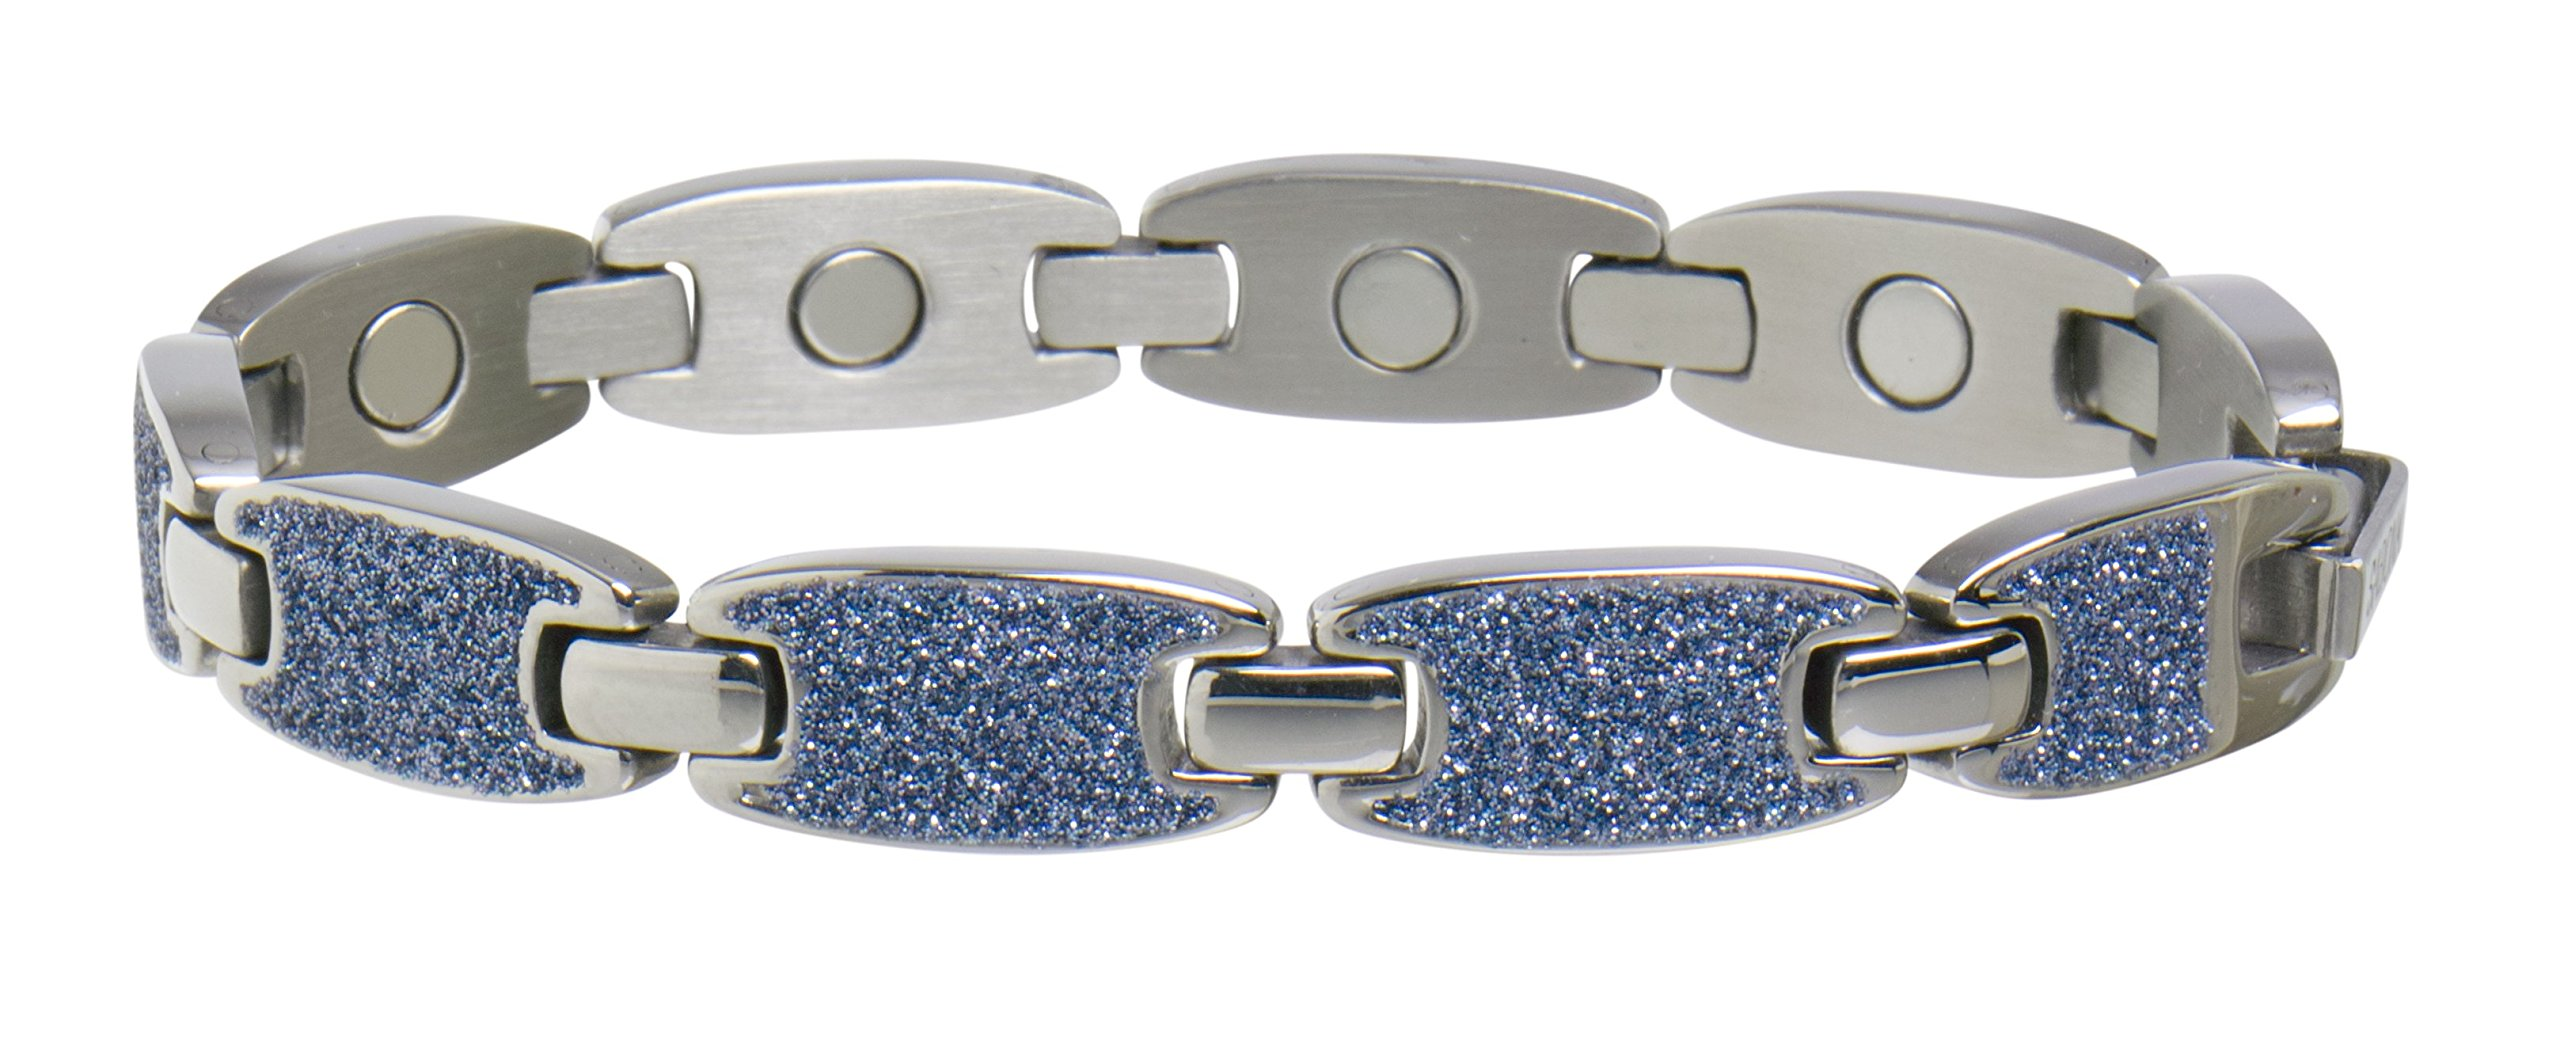 Sabona 28165 Caribbean Ocean Magnetic Bracelet in Silver, 0.1 Ounce by Sabona (Image #1)